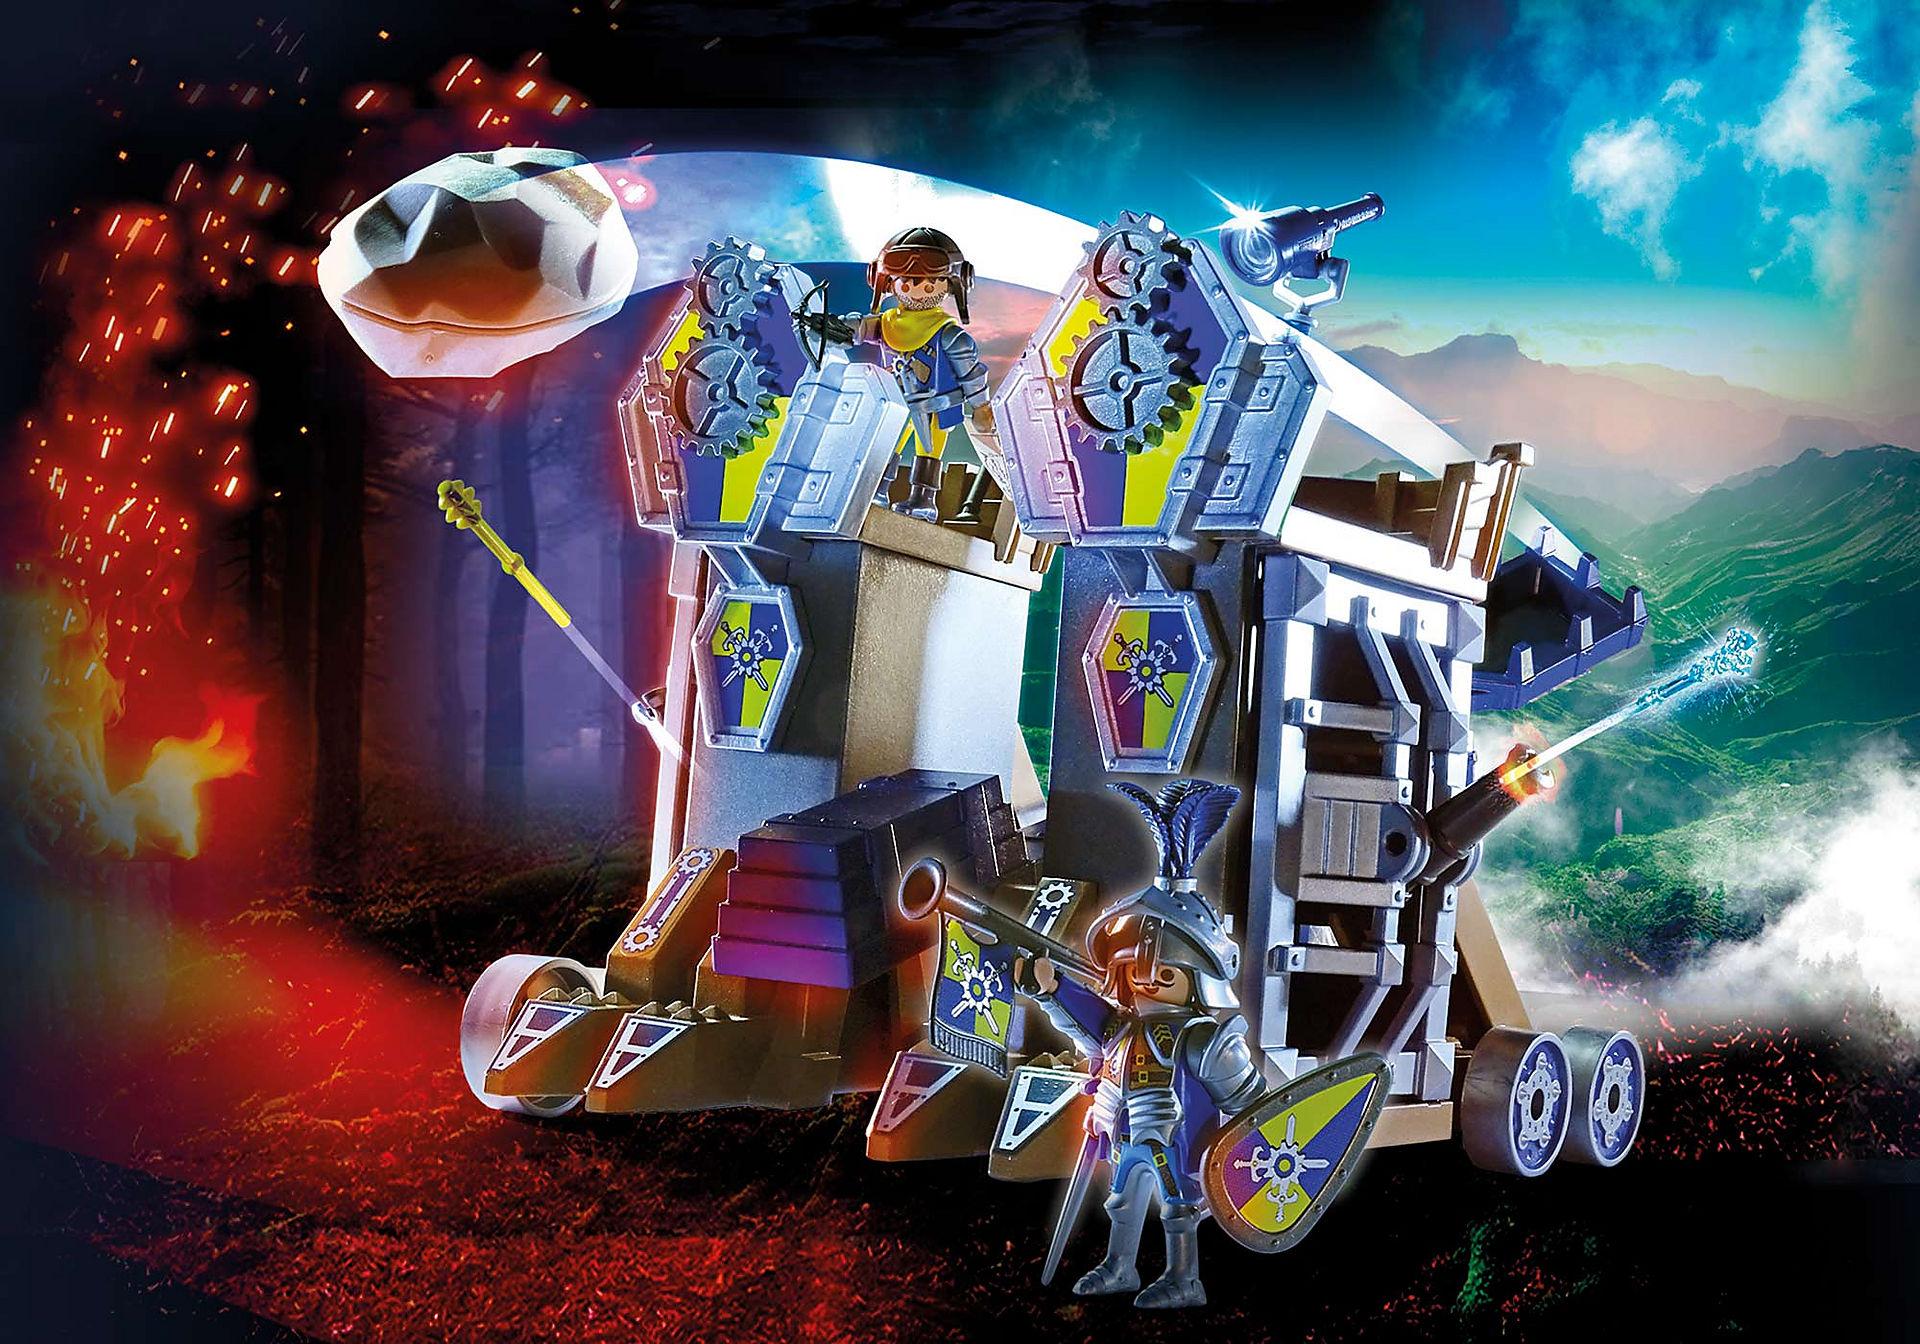 70391 Novelmore Mobile Katapultfestung zoom image1